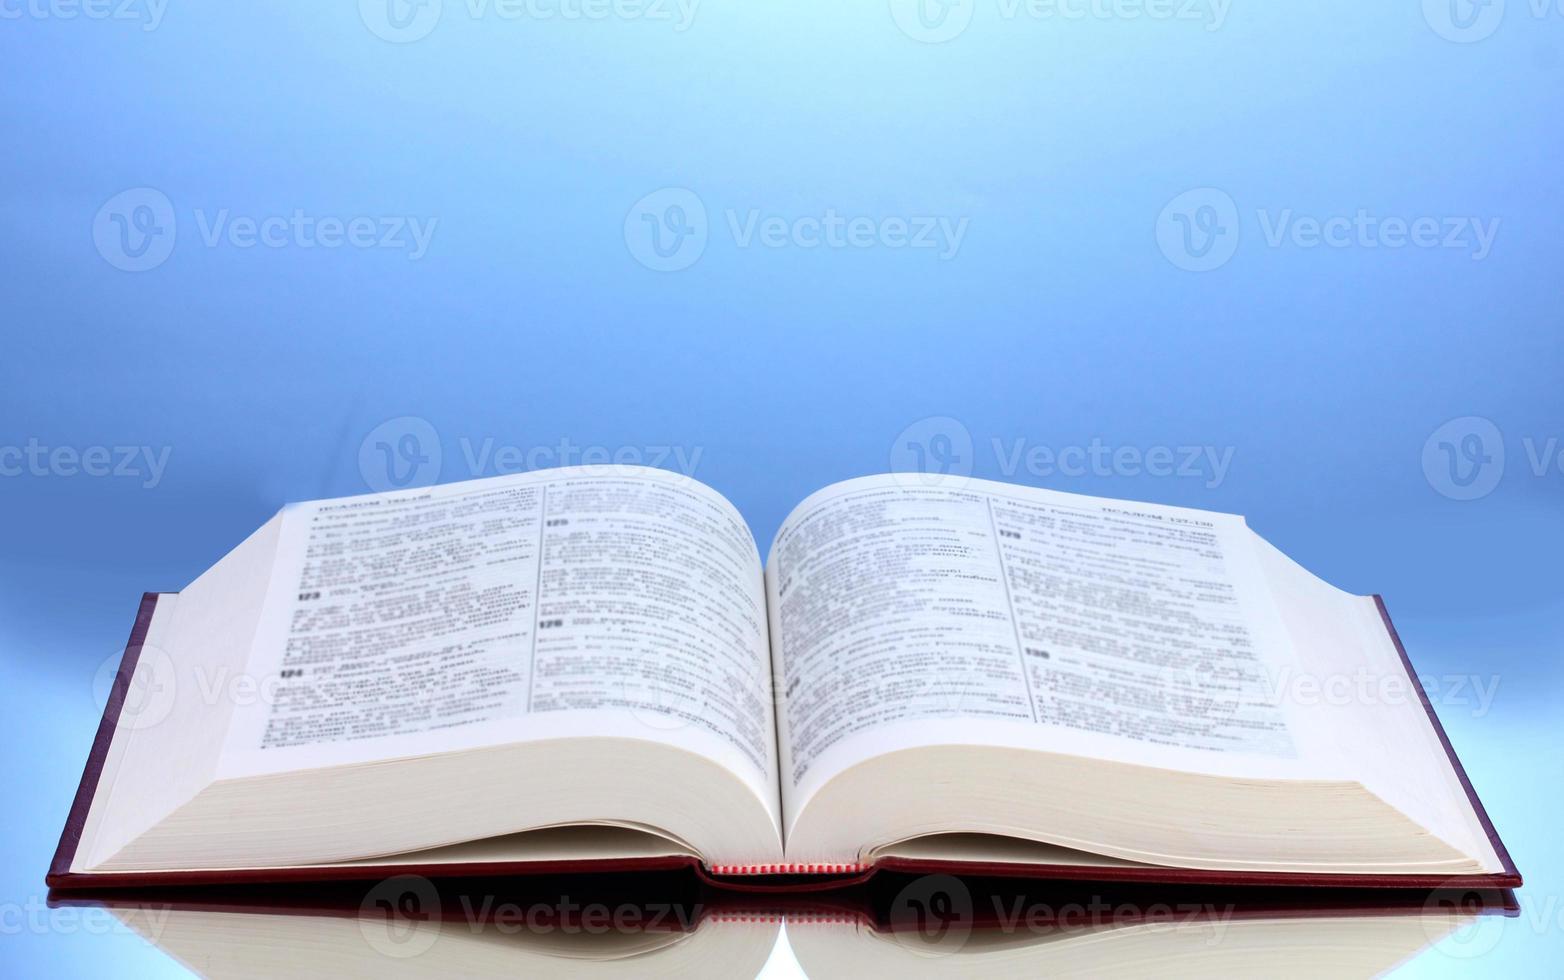 öppen bok på reflekterande yta av tabellen på blå bakgrund foto